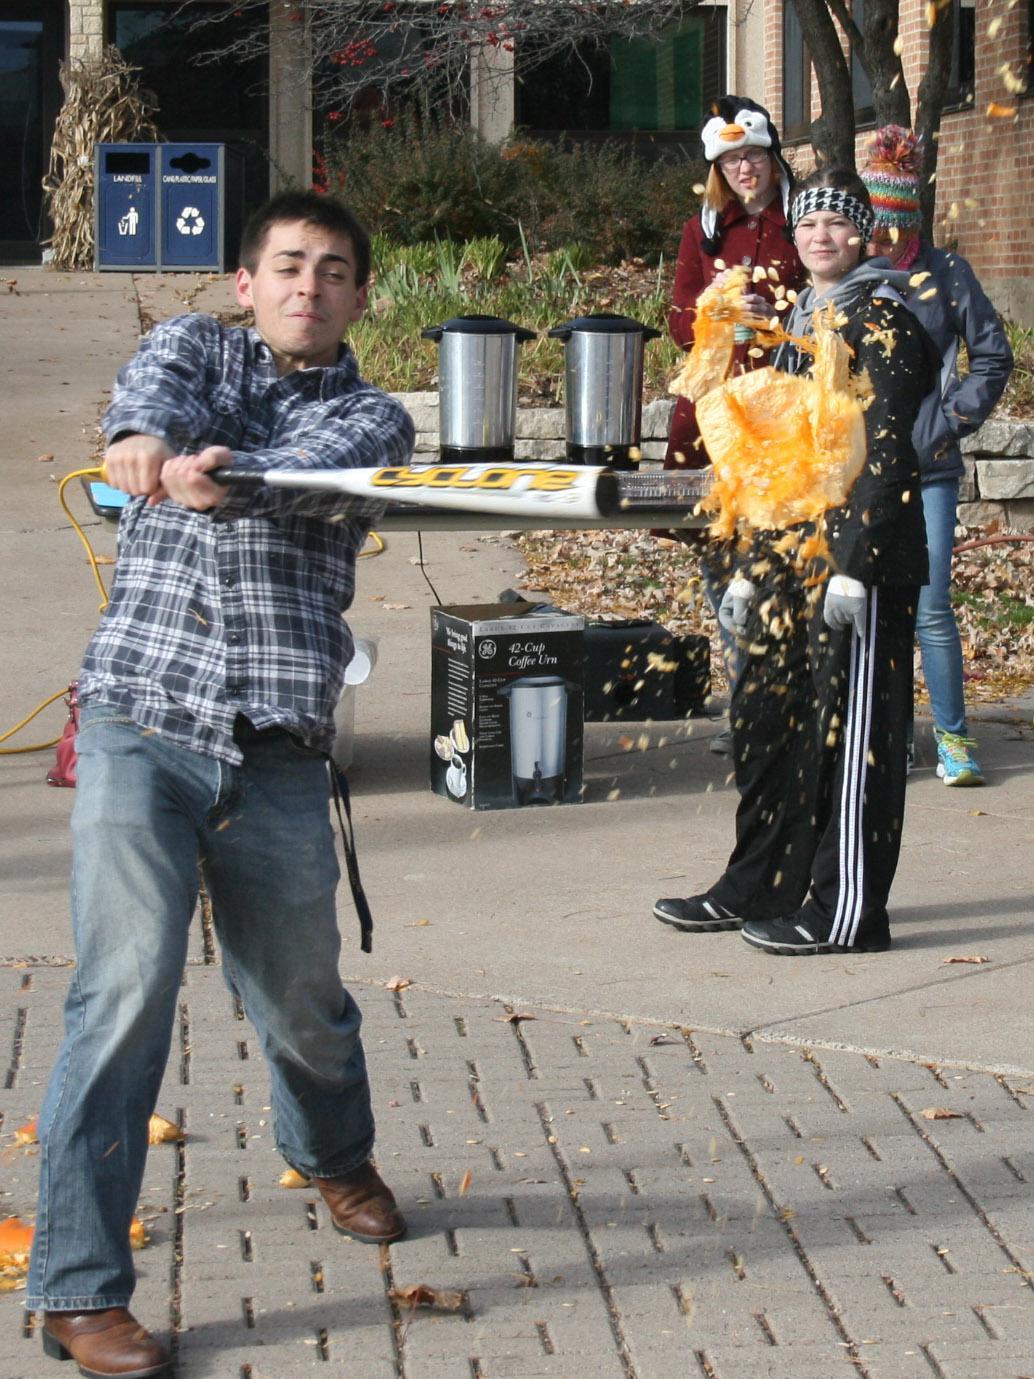 Fellow students watch as freshman chemistry major Chris Hartwick takes his turn at pumpkin smashing. - Photo by Austin Mai